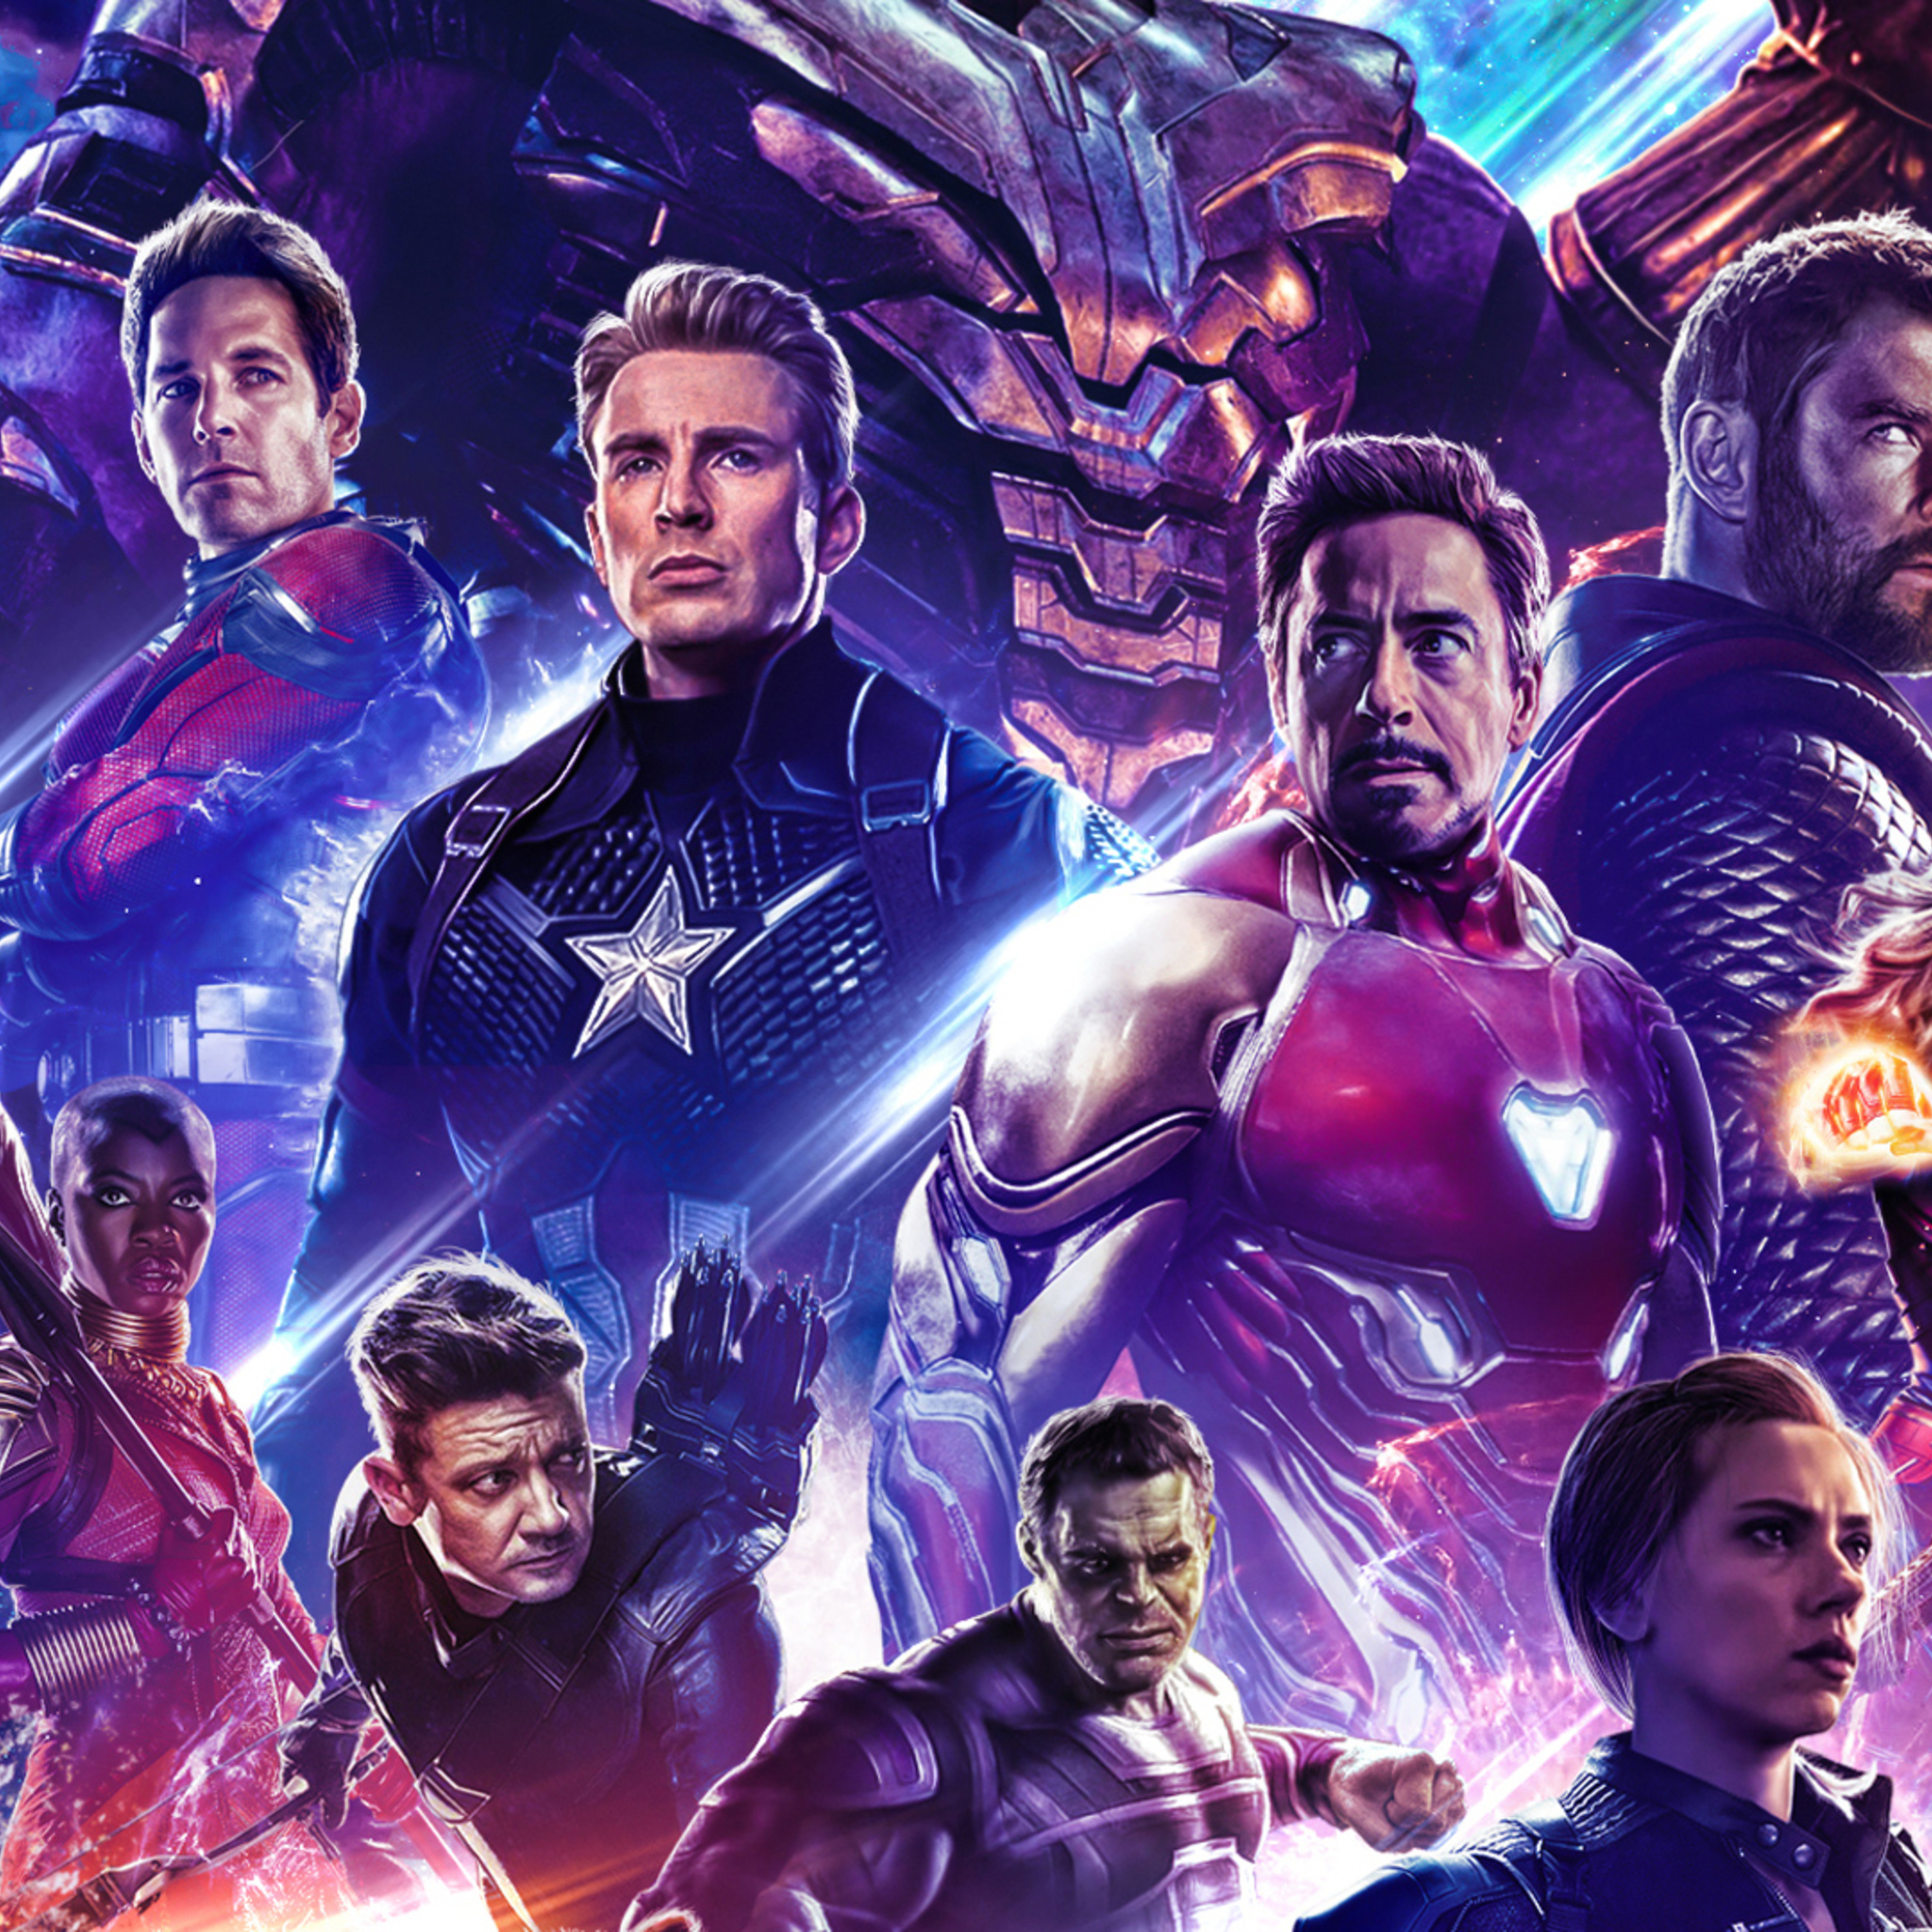 2048x2048 Poster Avengers Endgame 2019 Ipad Air HD 4k